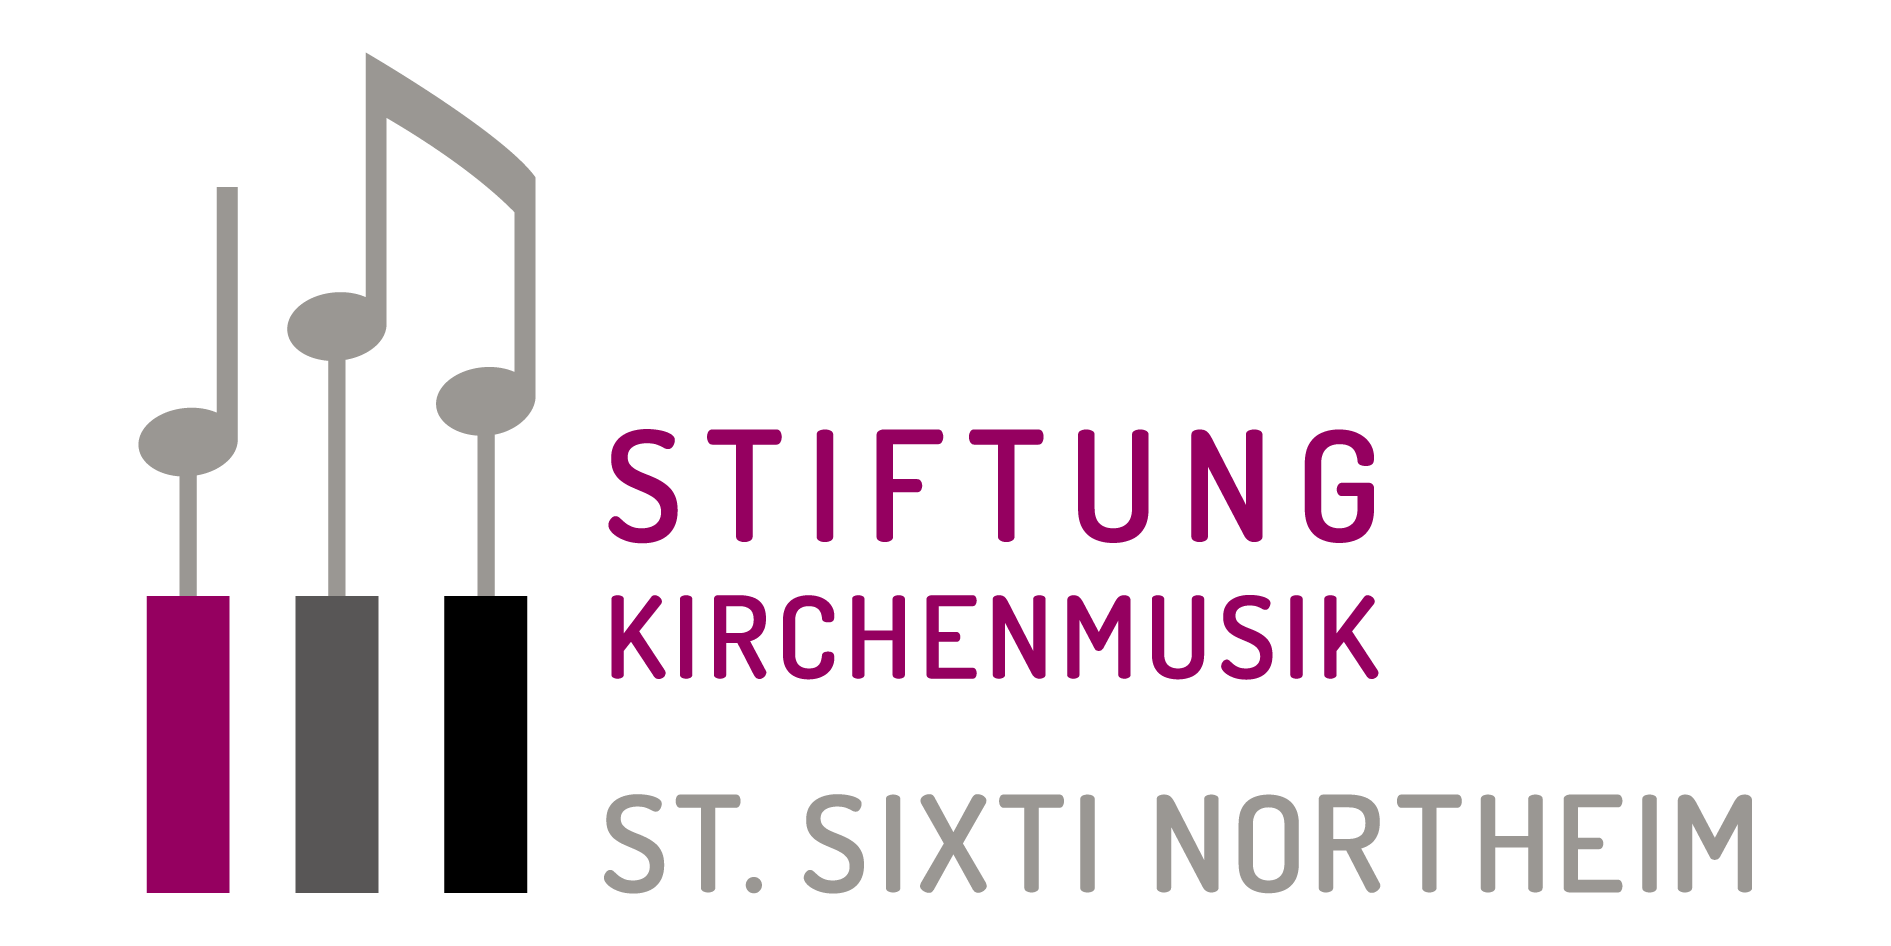 Stiftung Kirchenmusik Logo